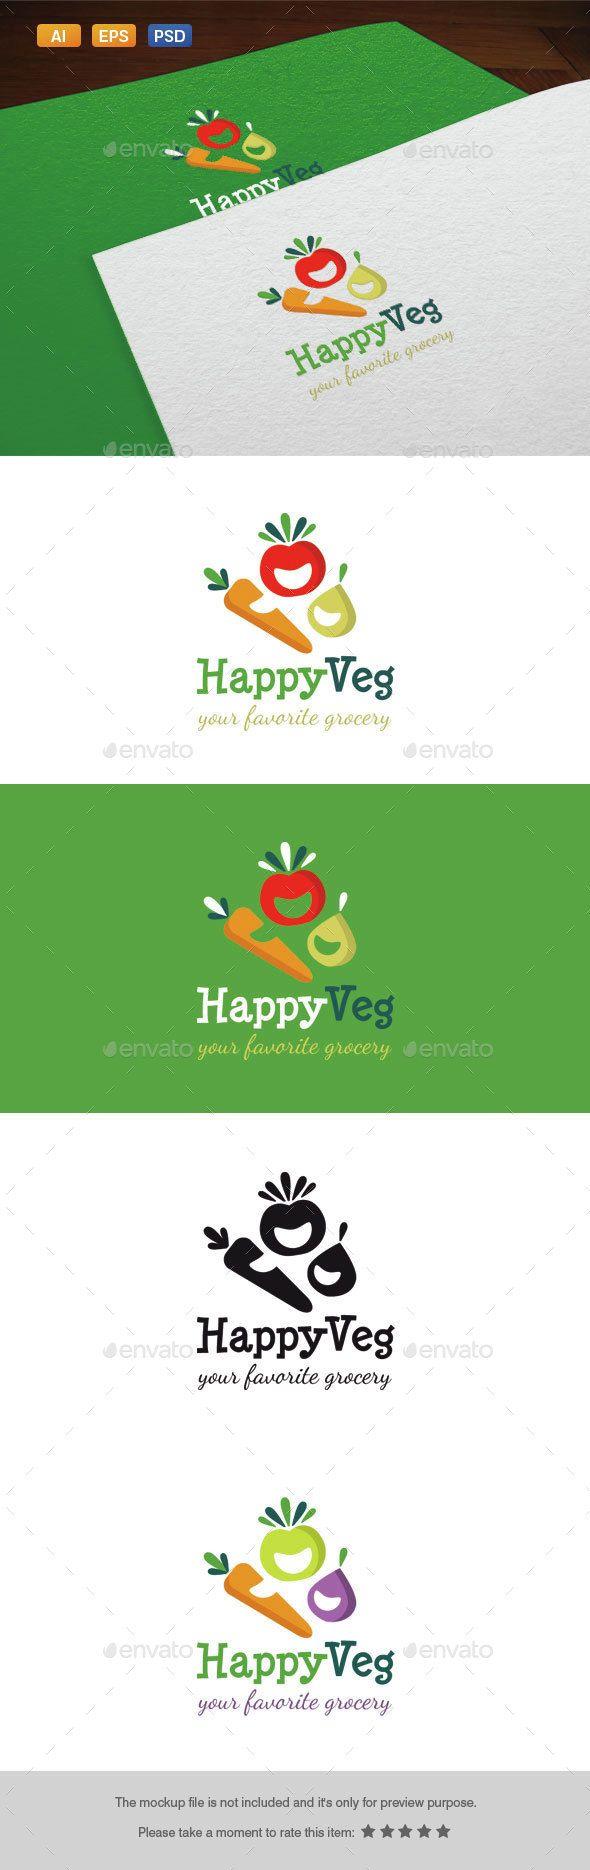 Happy Veg Logo Template PSD, Vector EPS, AI. Download here: http://graphicriver.net/item/happy-veg-logo/14575398?ref=ksioks